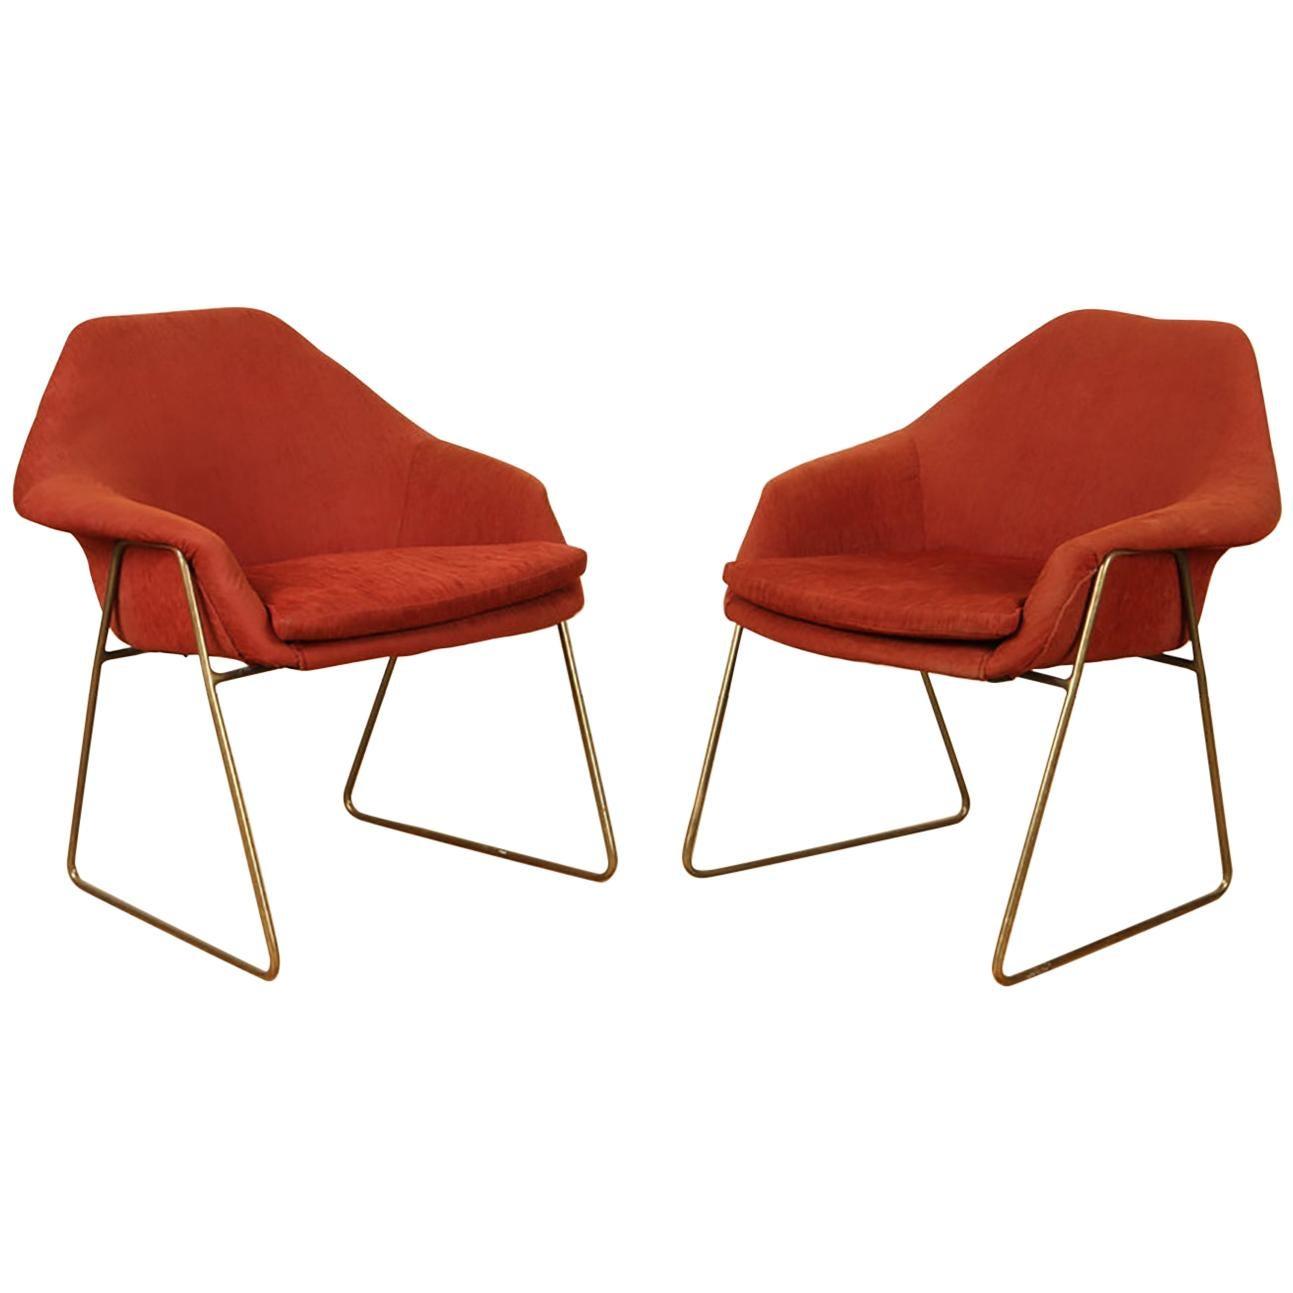 Pair of Mid-Century Modern Upholstered Chairs Raised on Bronze Legs